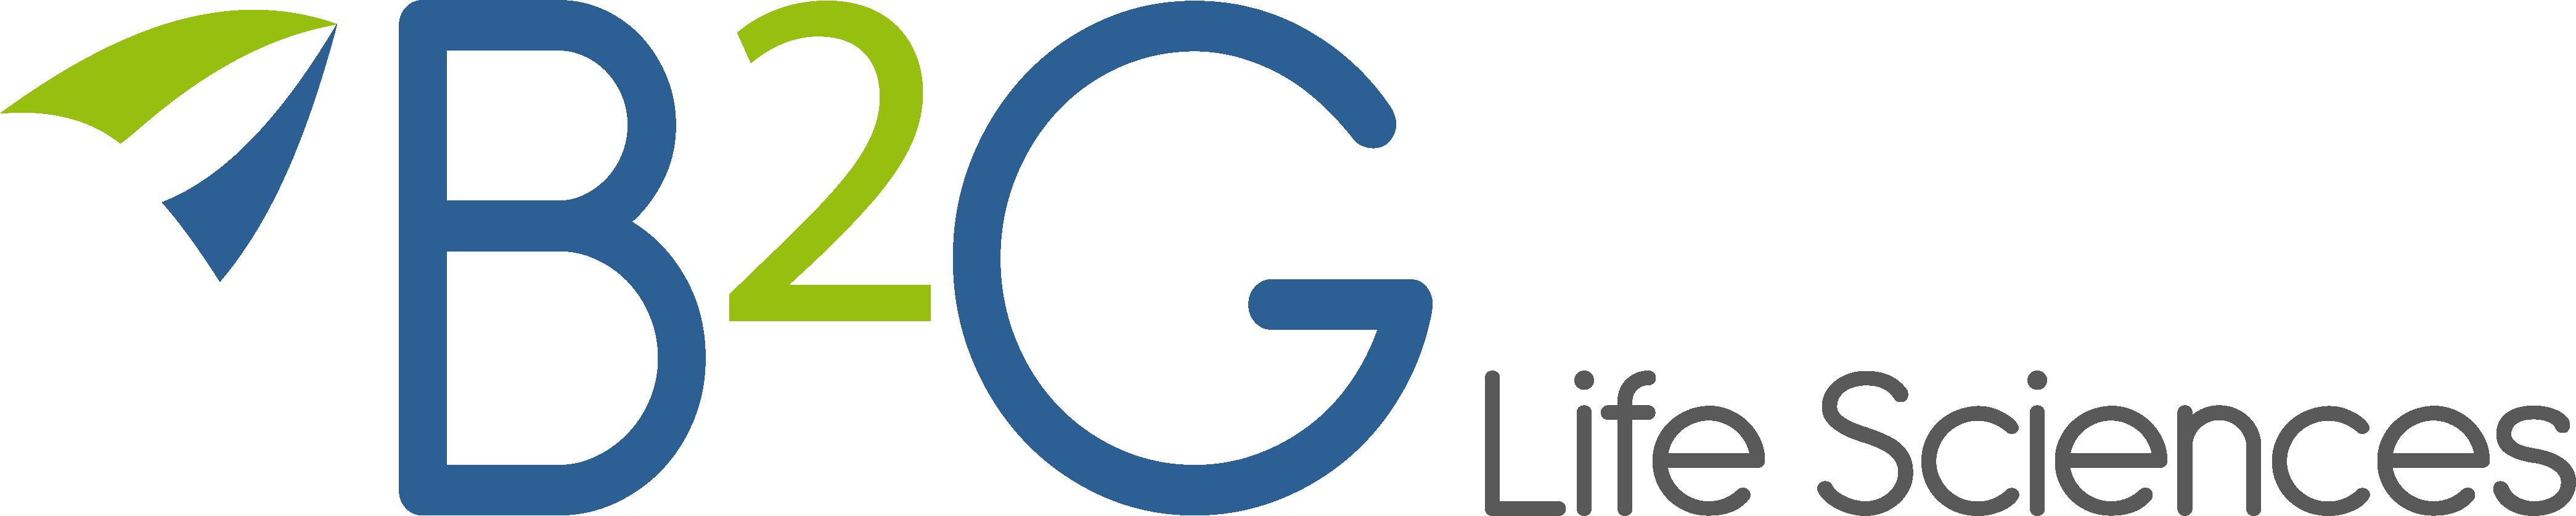 logo B2G Life Sciences